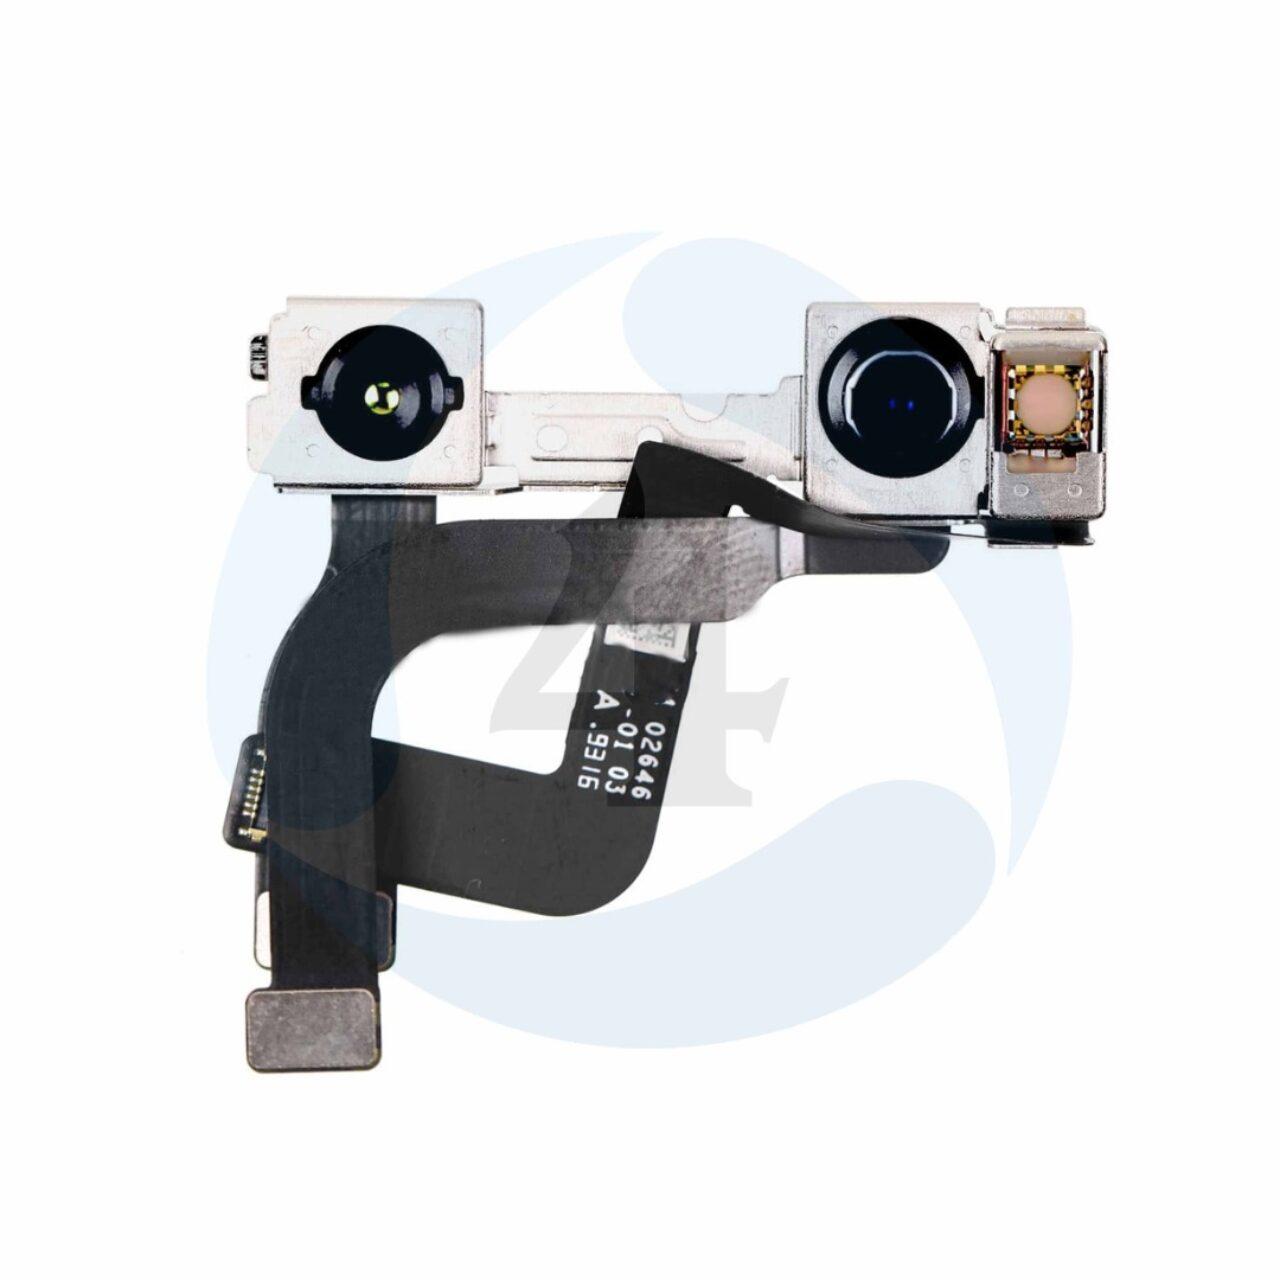 Powerflex volumeflex For Xiaomi Mi Note 10 M1910 F4 G Note 10 Pro M1910 F4 S